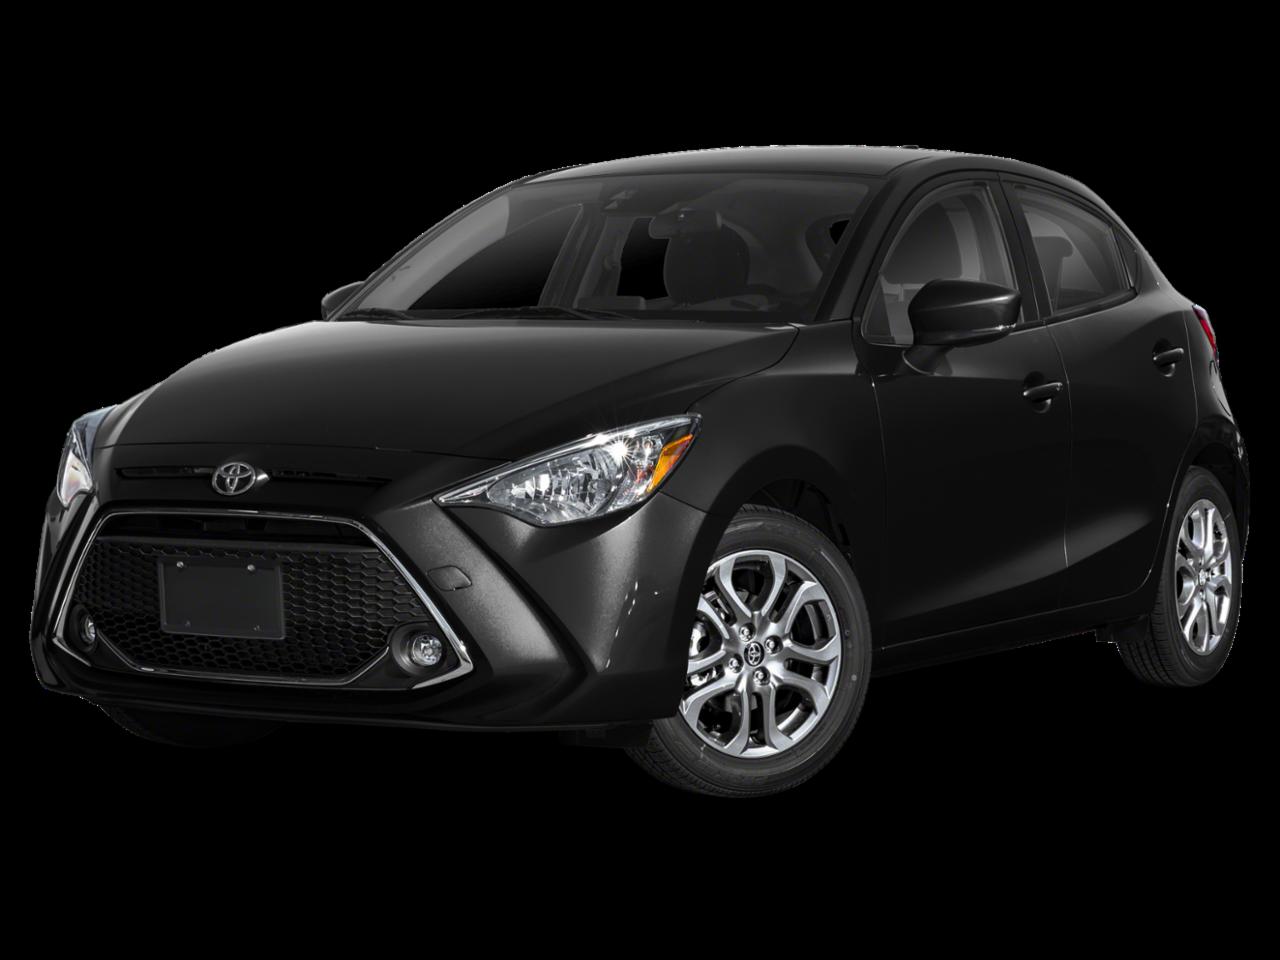 Toyota 2020 Yaris Hatchback LE